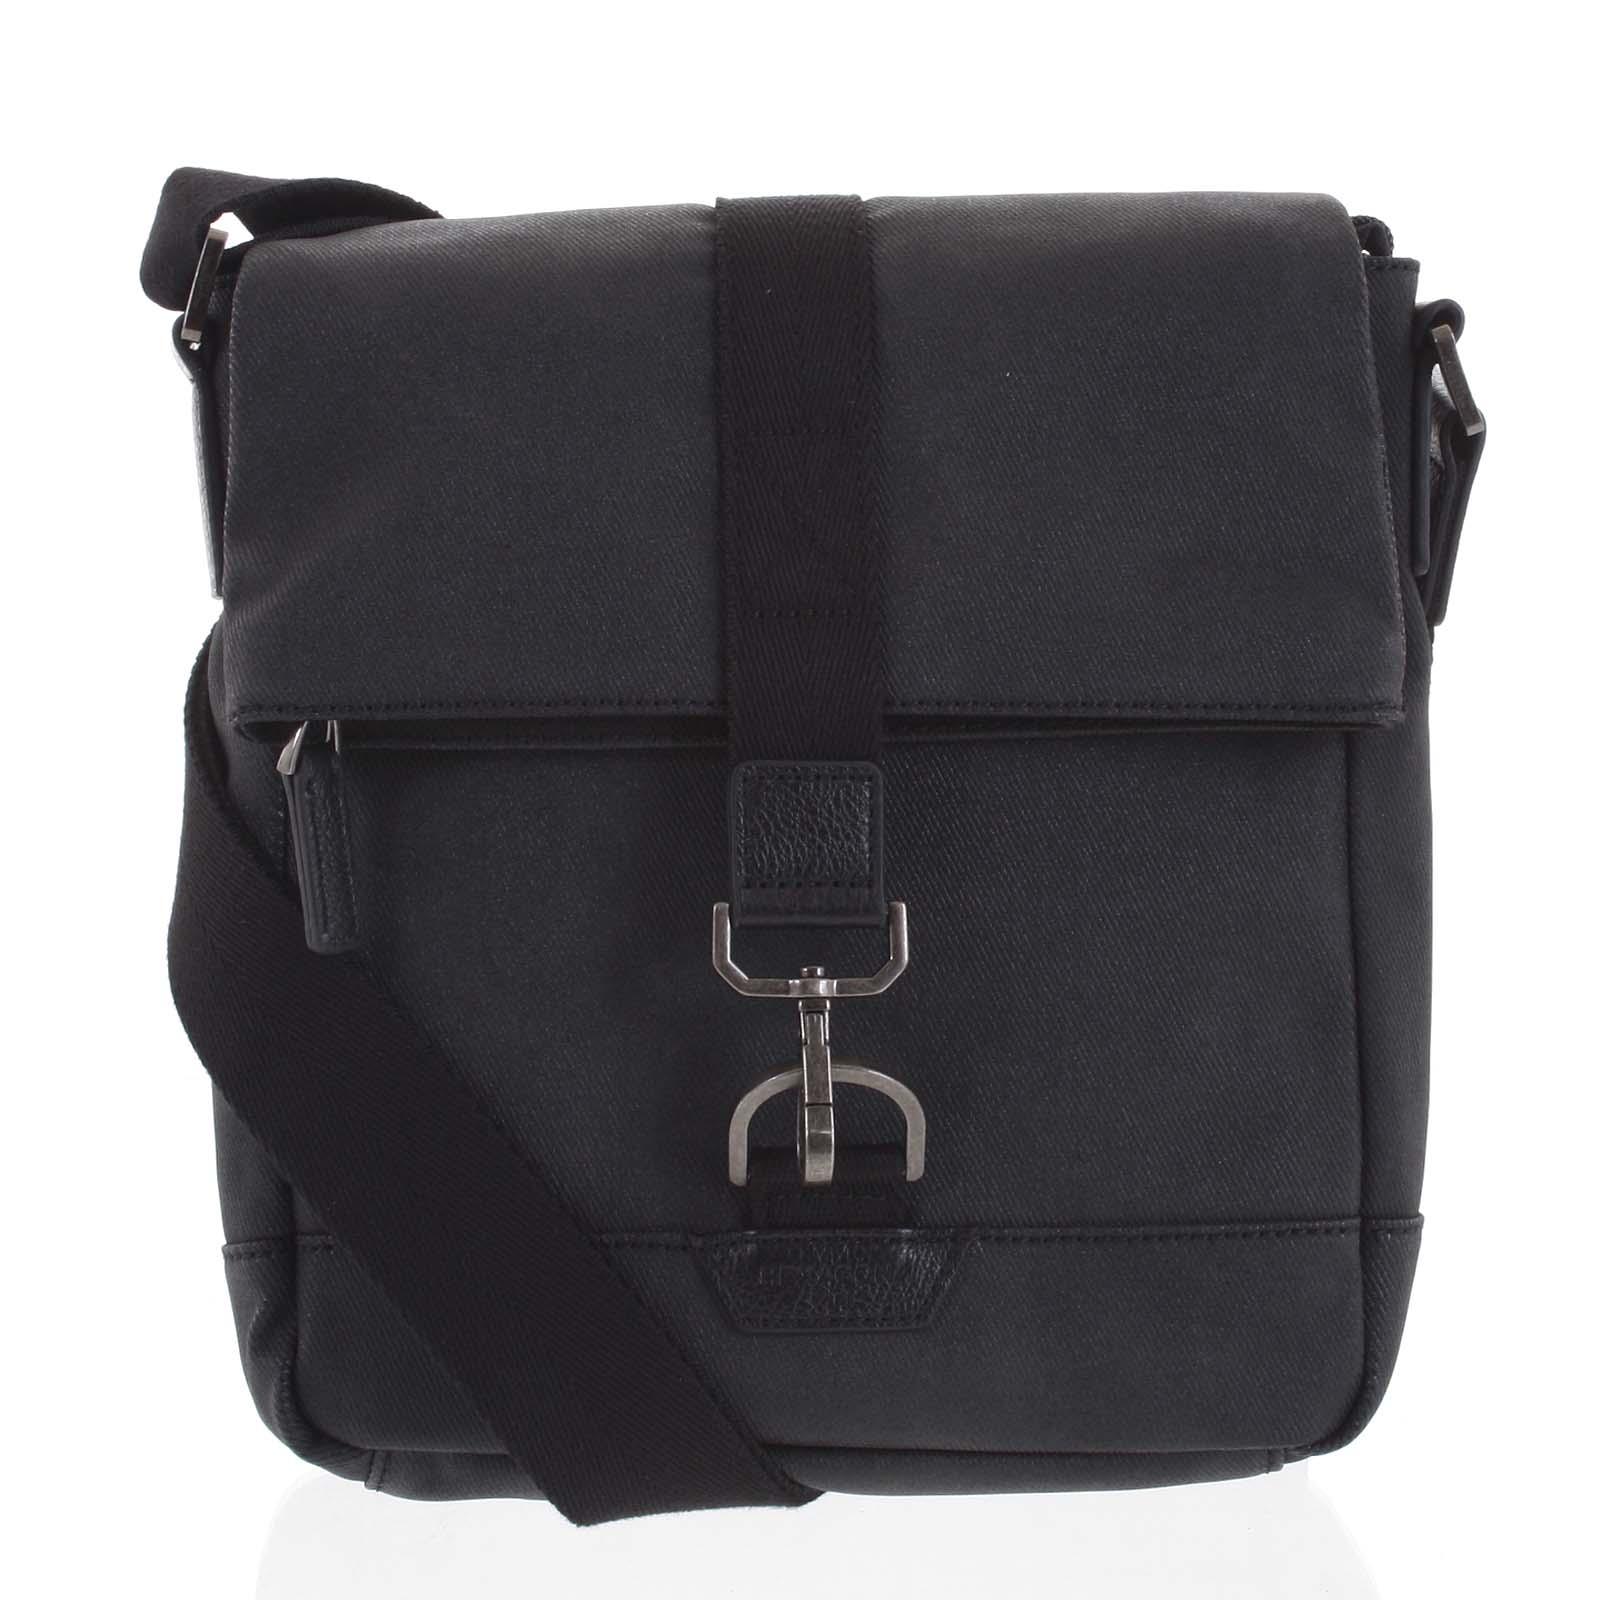 Pánská taška přes rameno černá - Hexagona Bennio černá